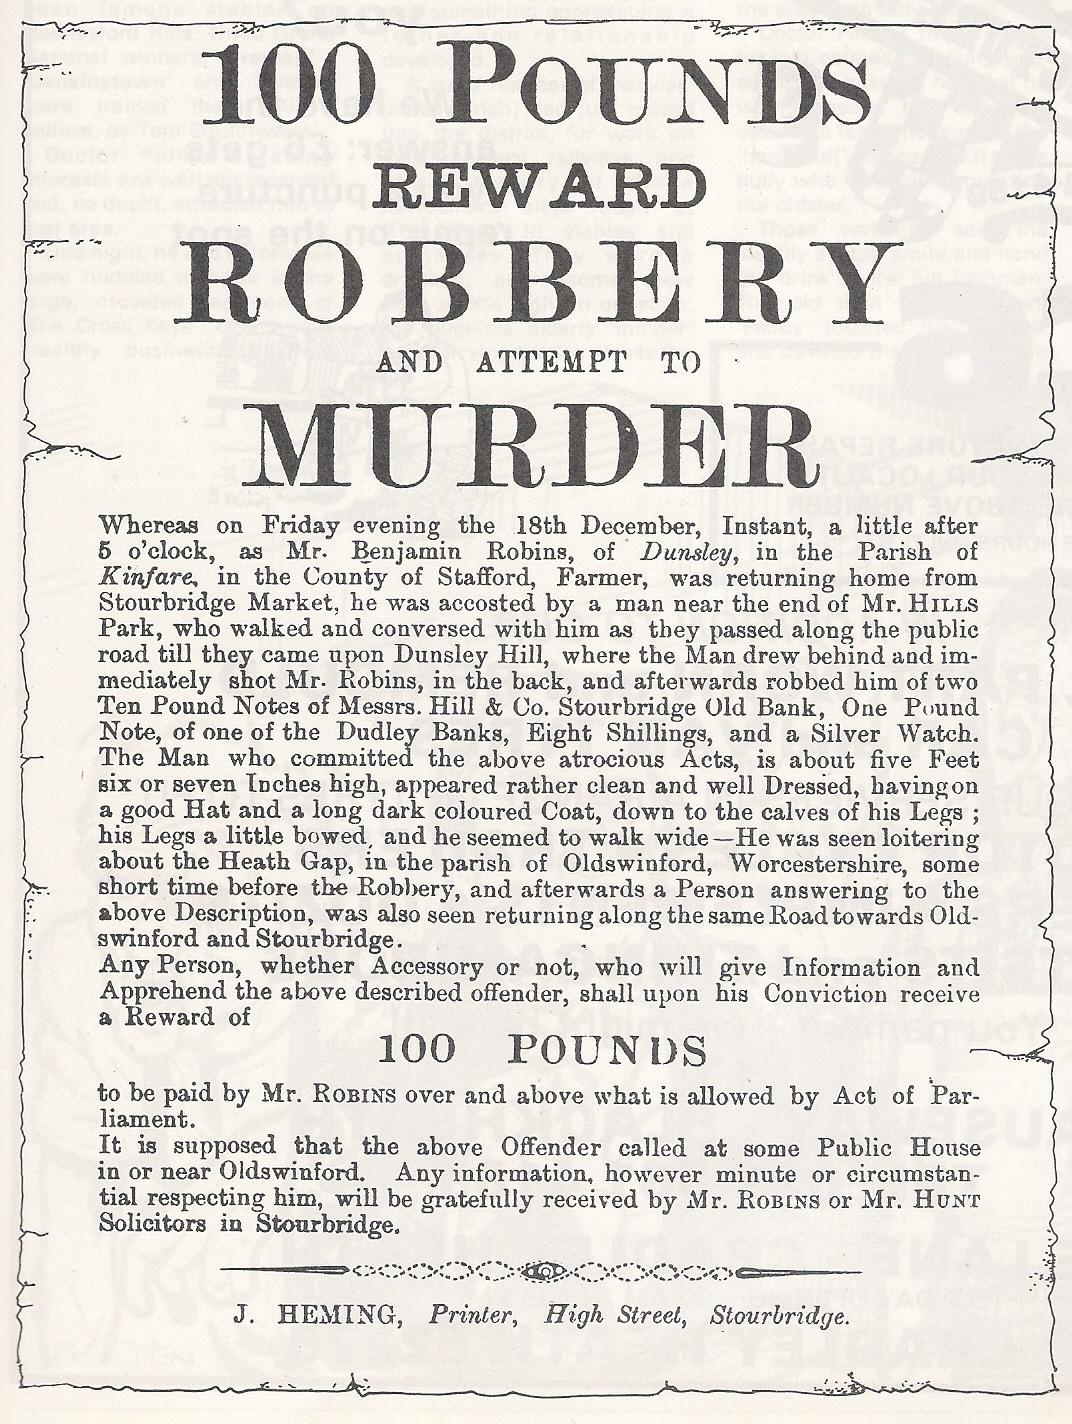 Reward Poster. 1812.